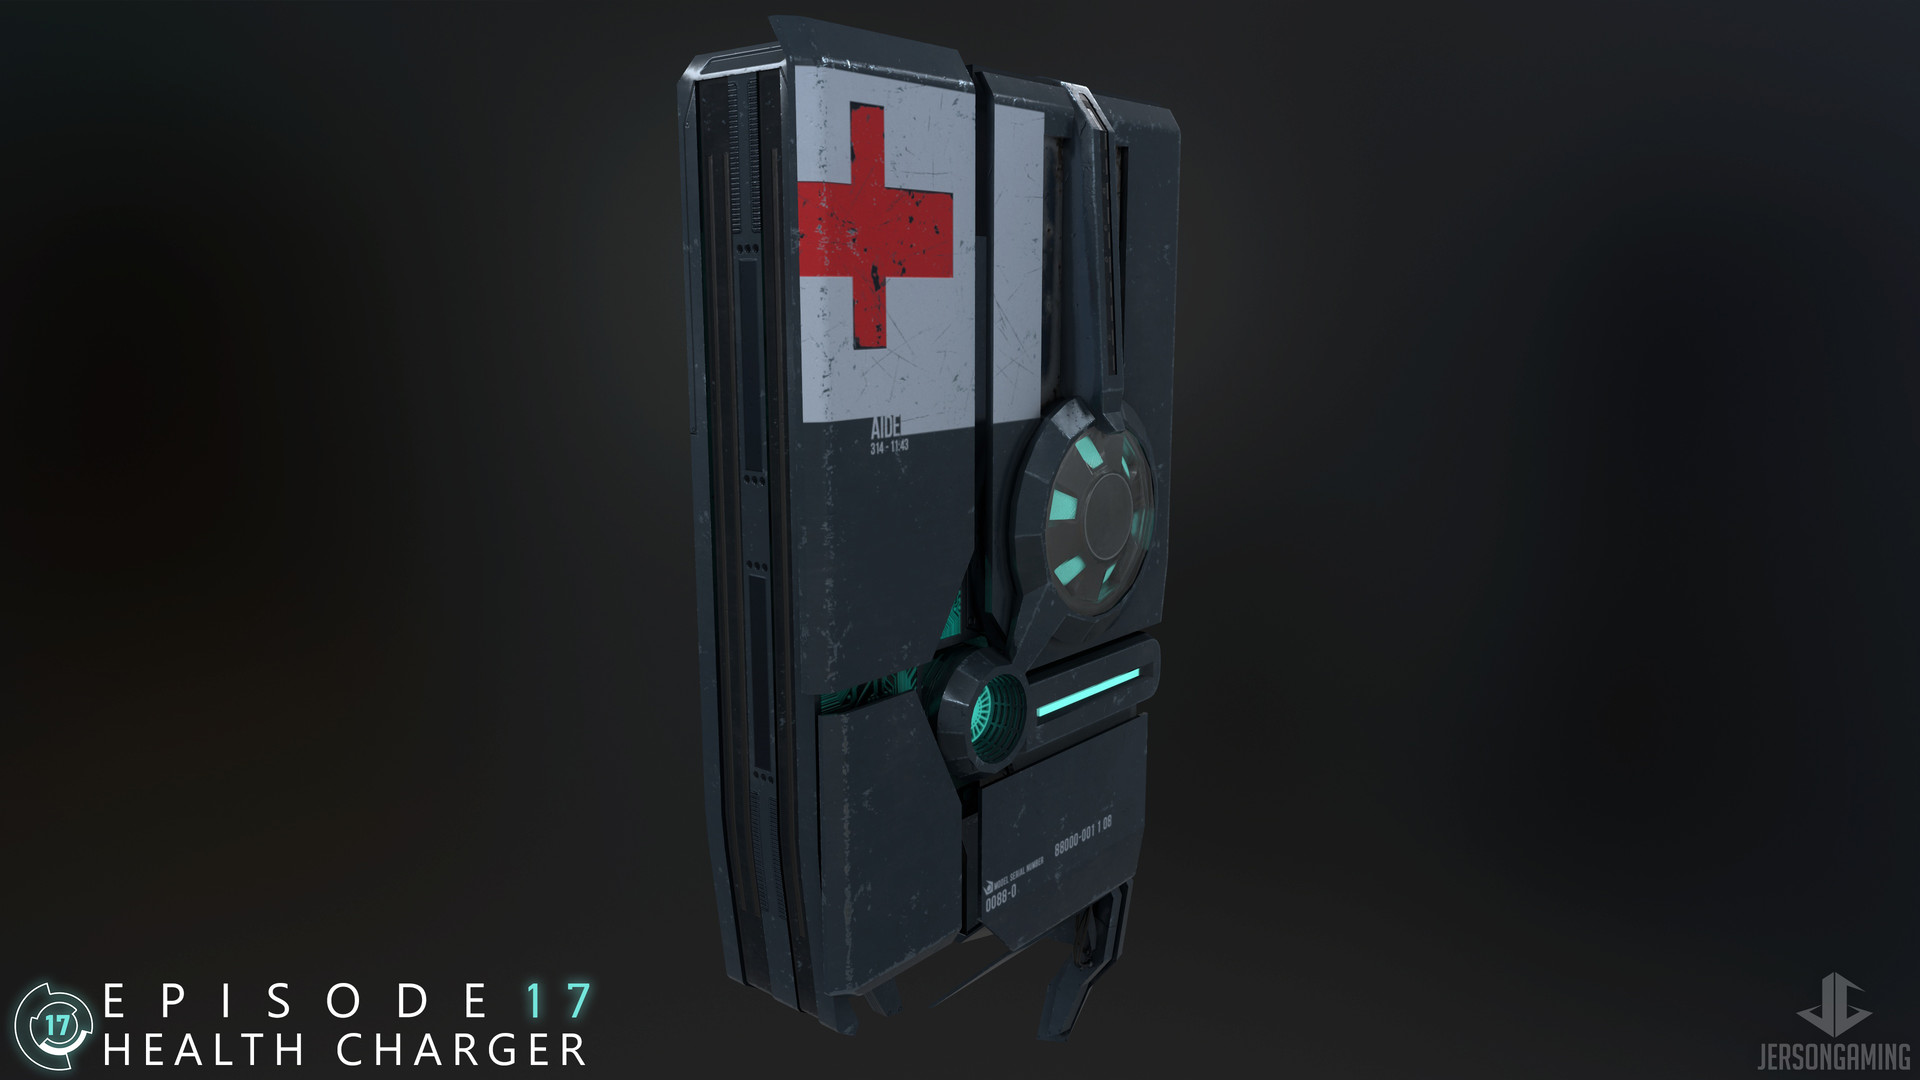 ArtStation - Half-Life 2: Episode 17  Health Charger, Jerson